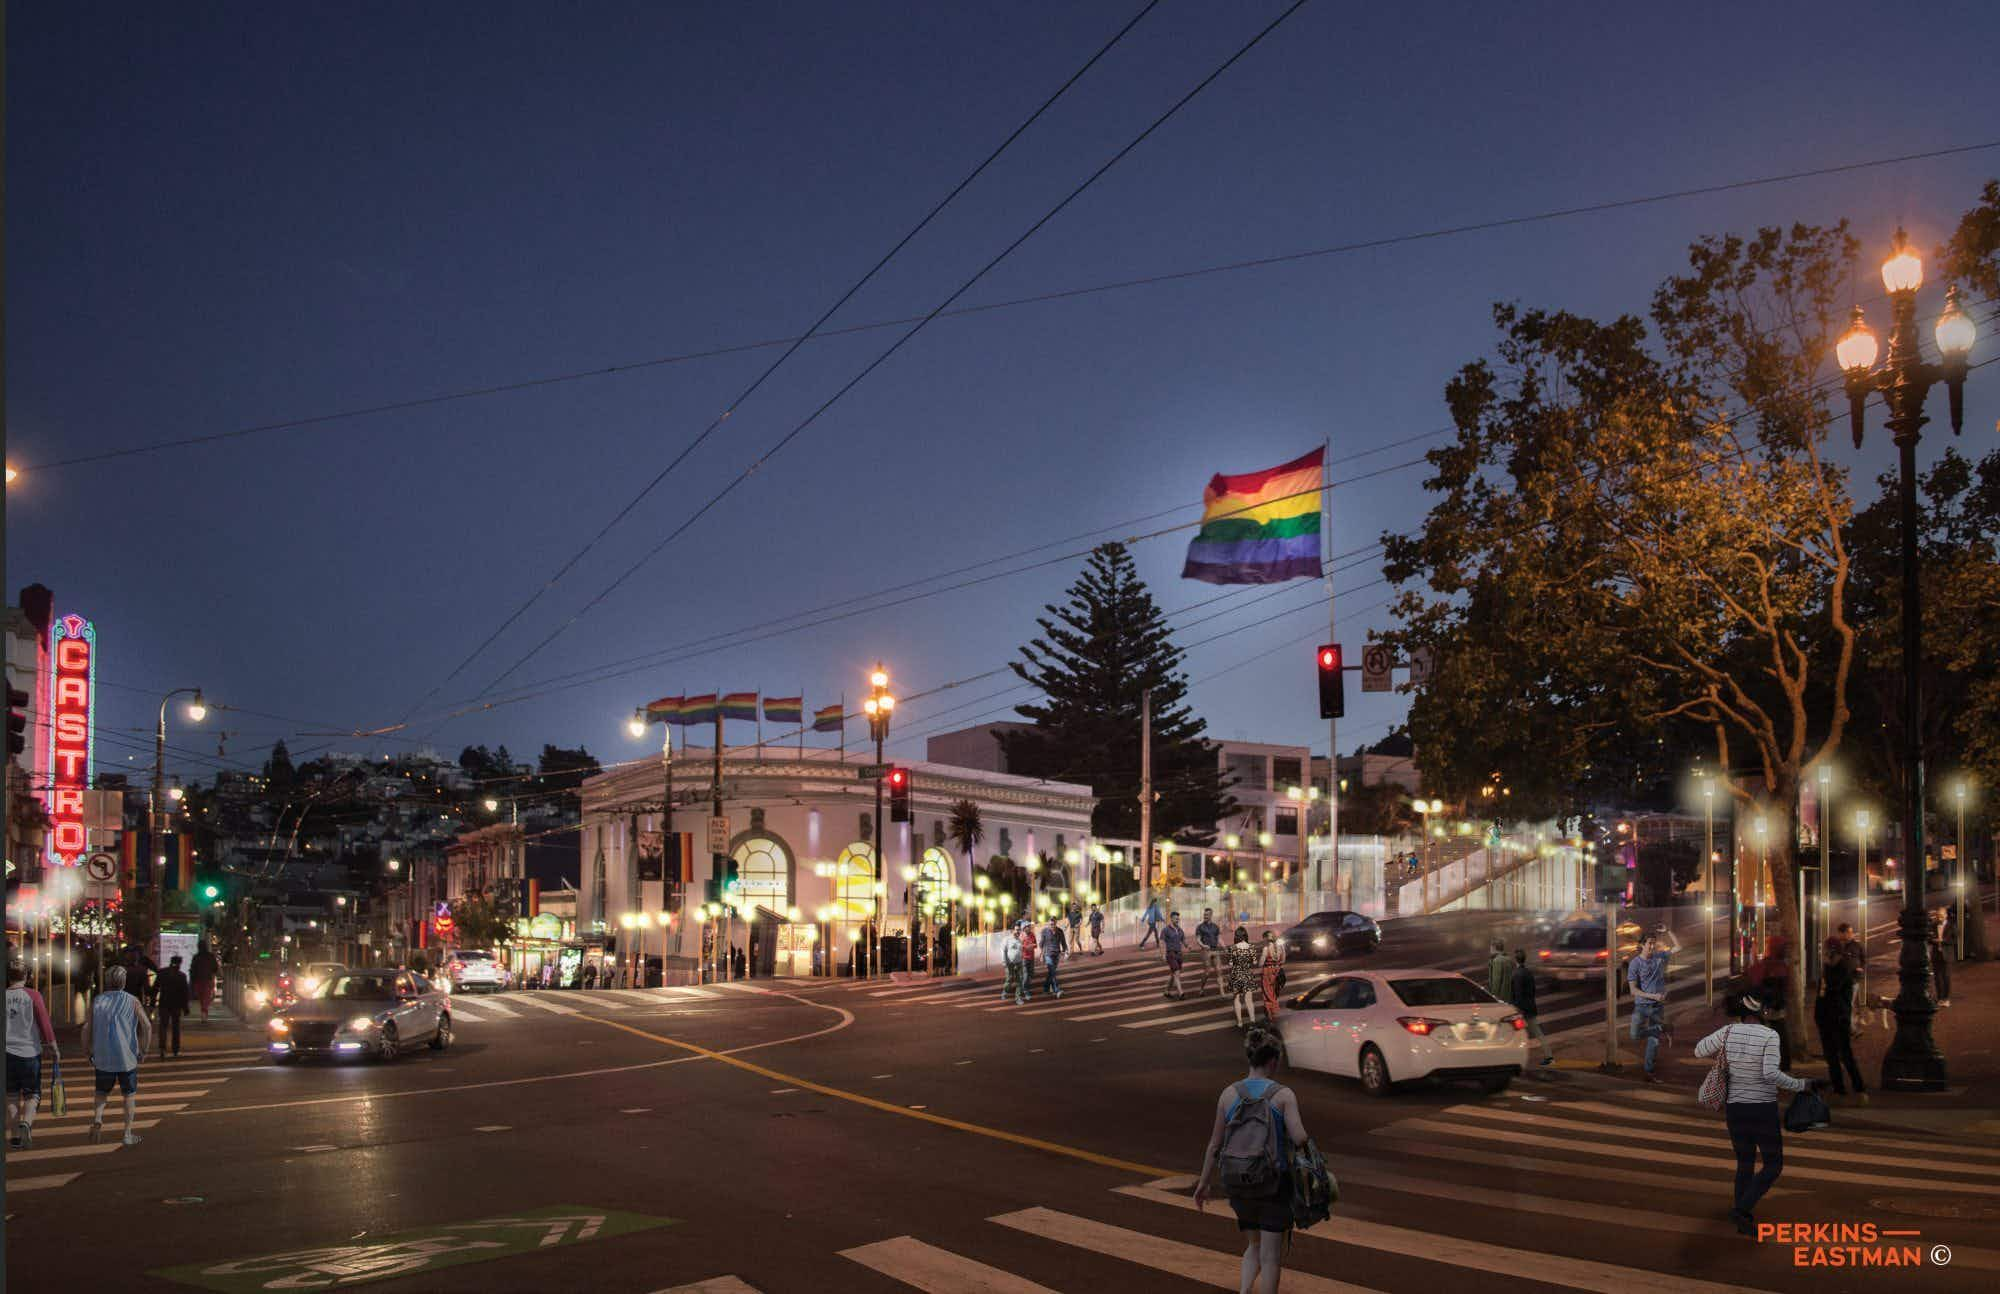 San Francisco to build new memorial honoring gay rights activist Harvey Milk